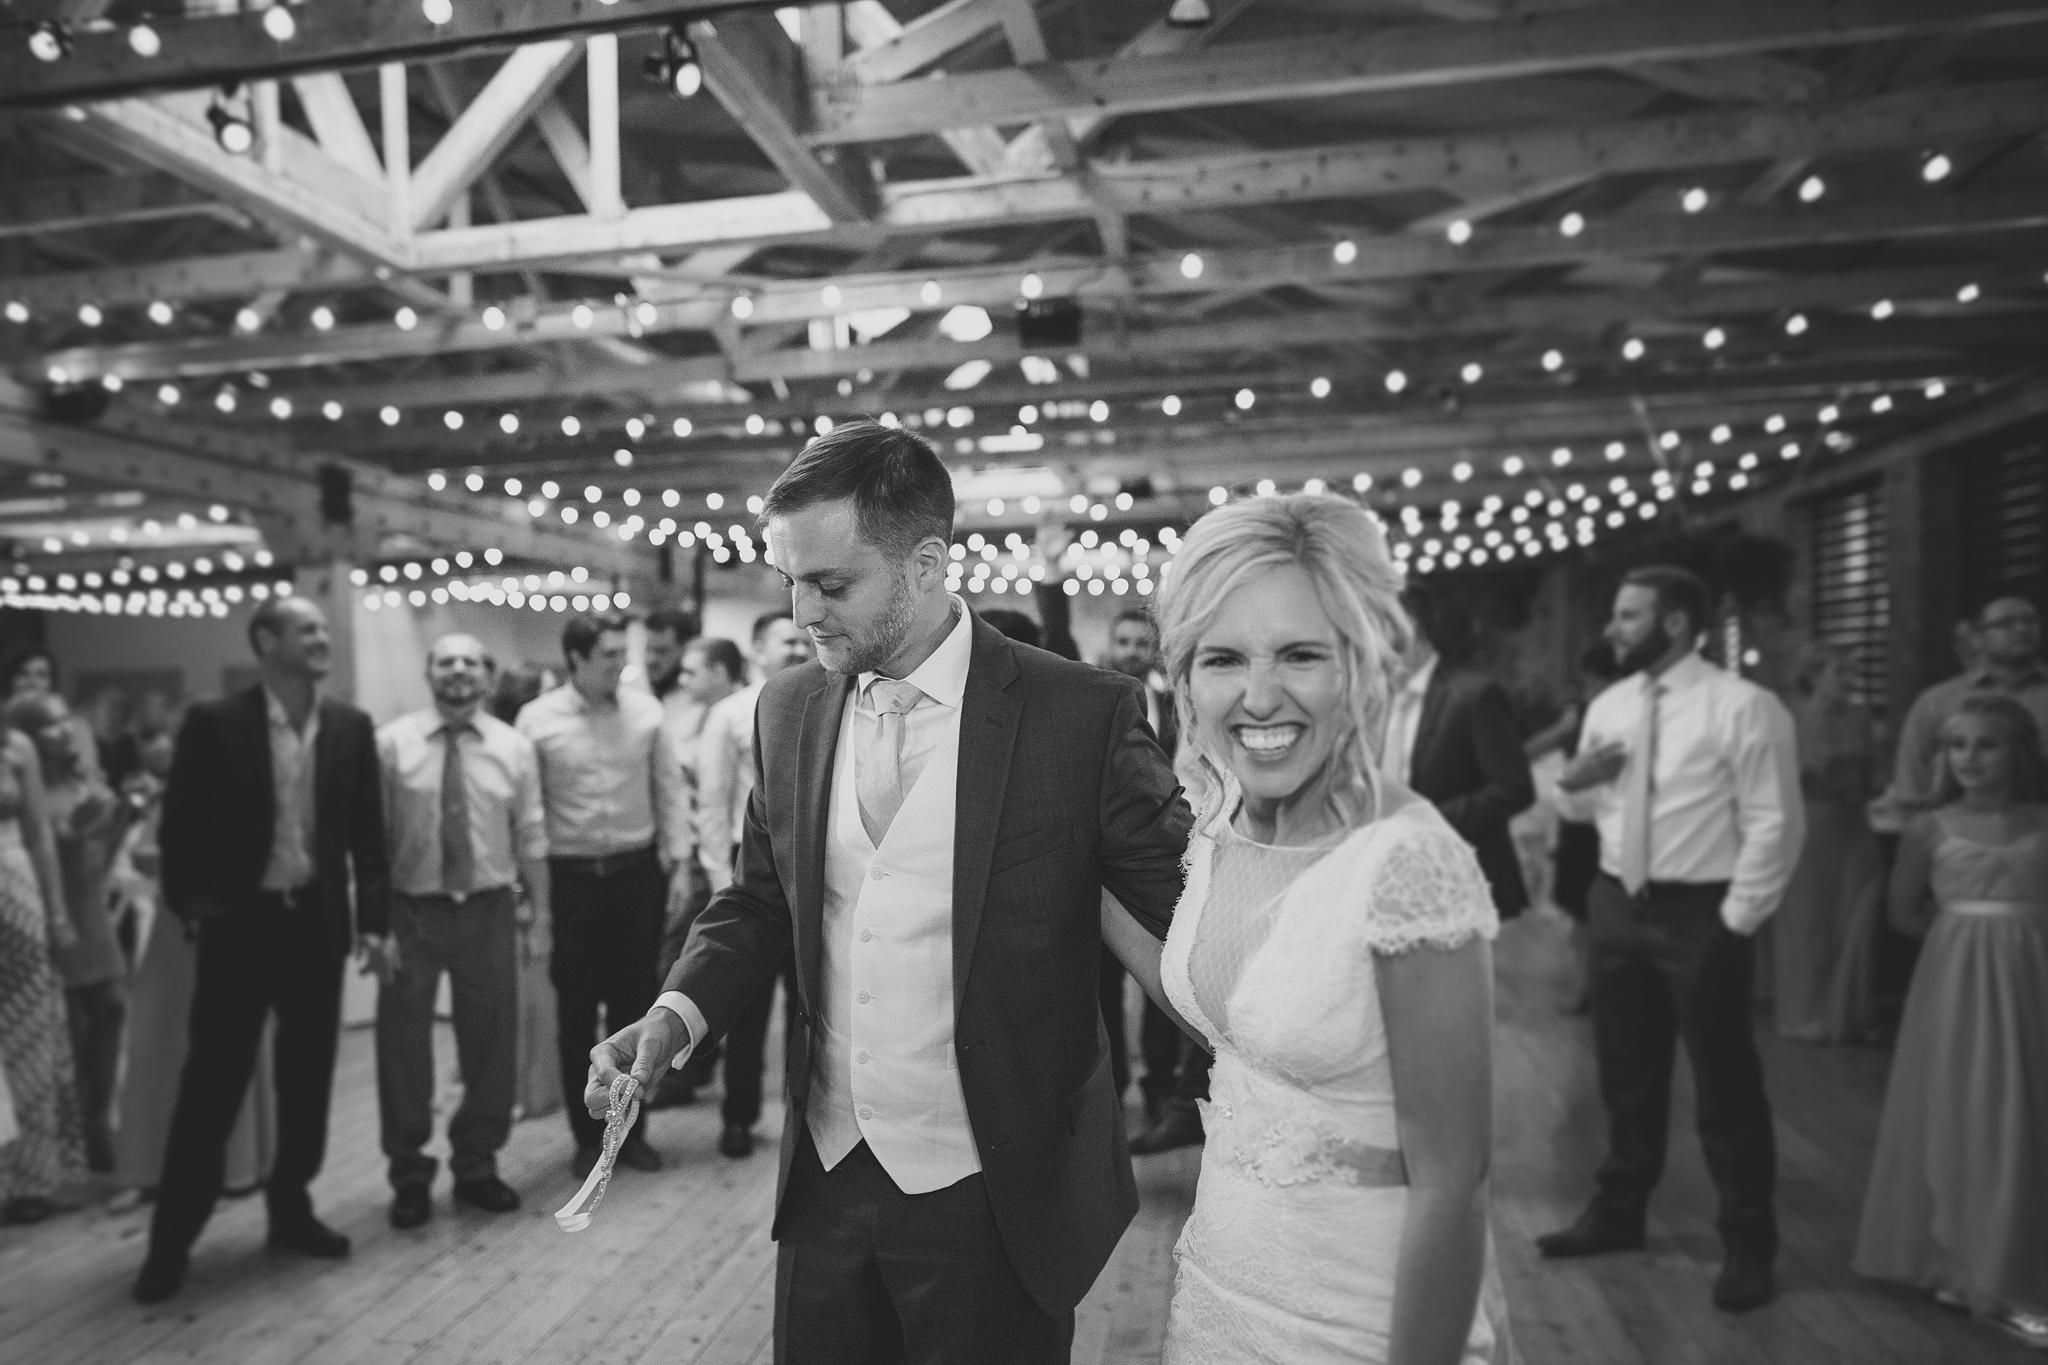 Cincinnati-Dayton-OH-Traveling-Wedding-Photographer-Rhinegeist-Brewery-Ault-Park-21C-155.jpg